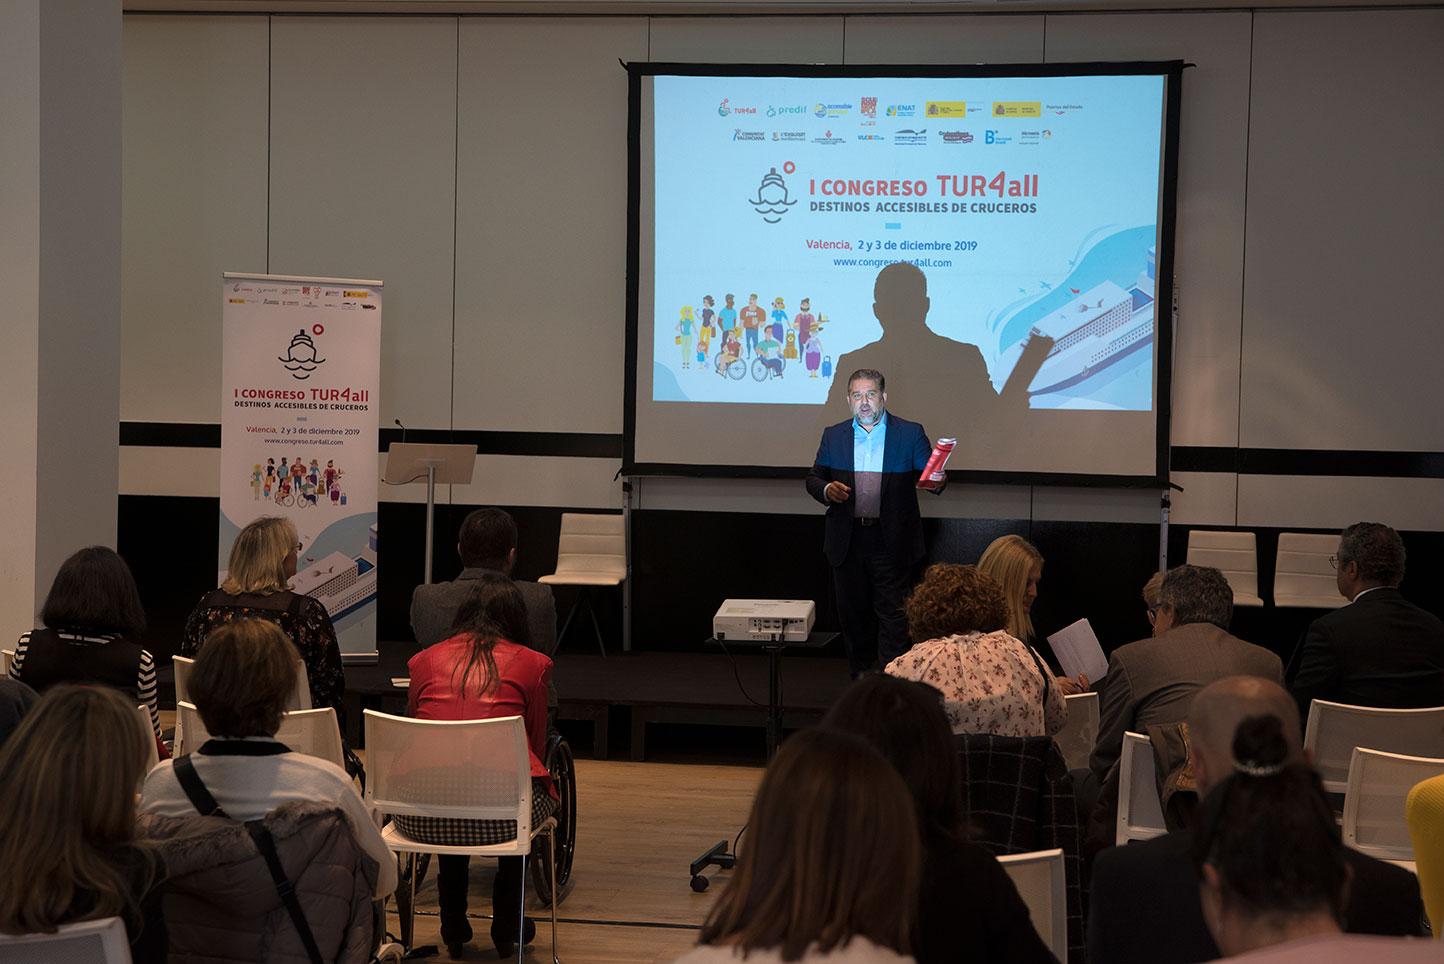 Fernando-Valmaseda-Presentation-Congress-Madrid-in-November